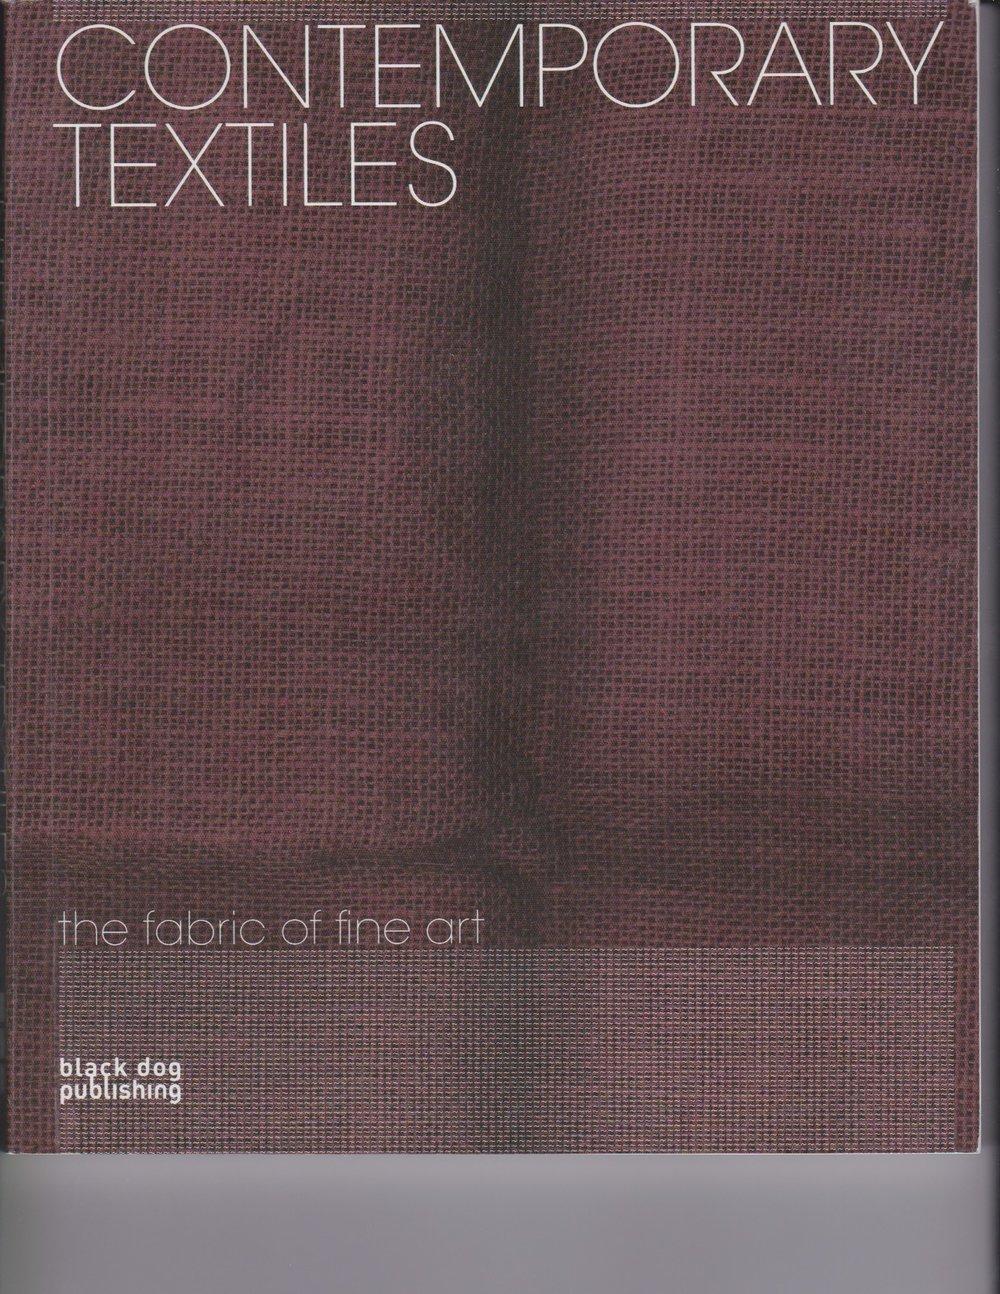 Contemp Textile cover.jpeg